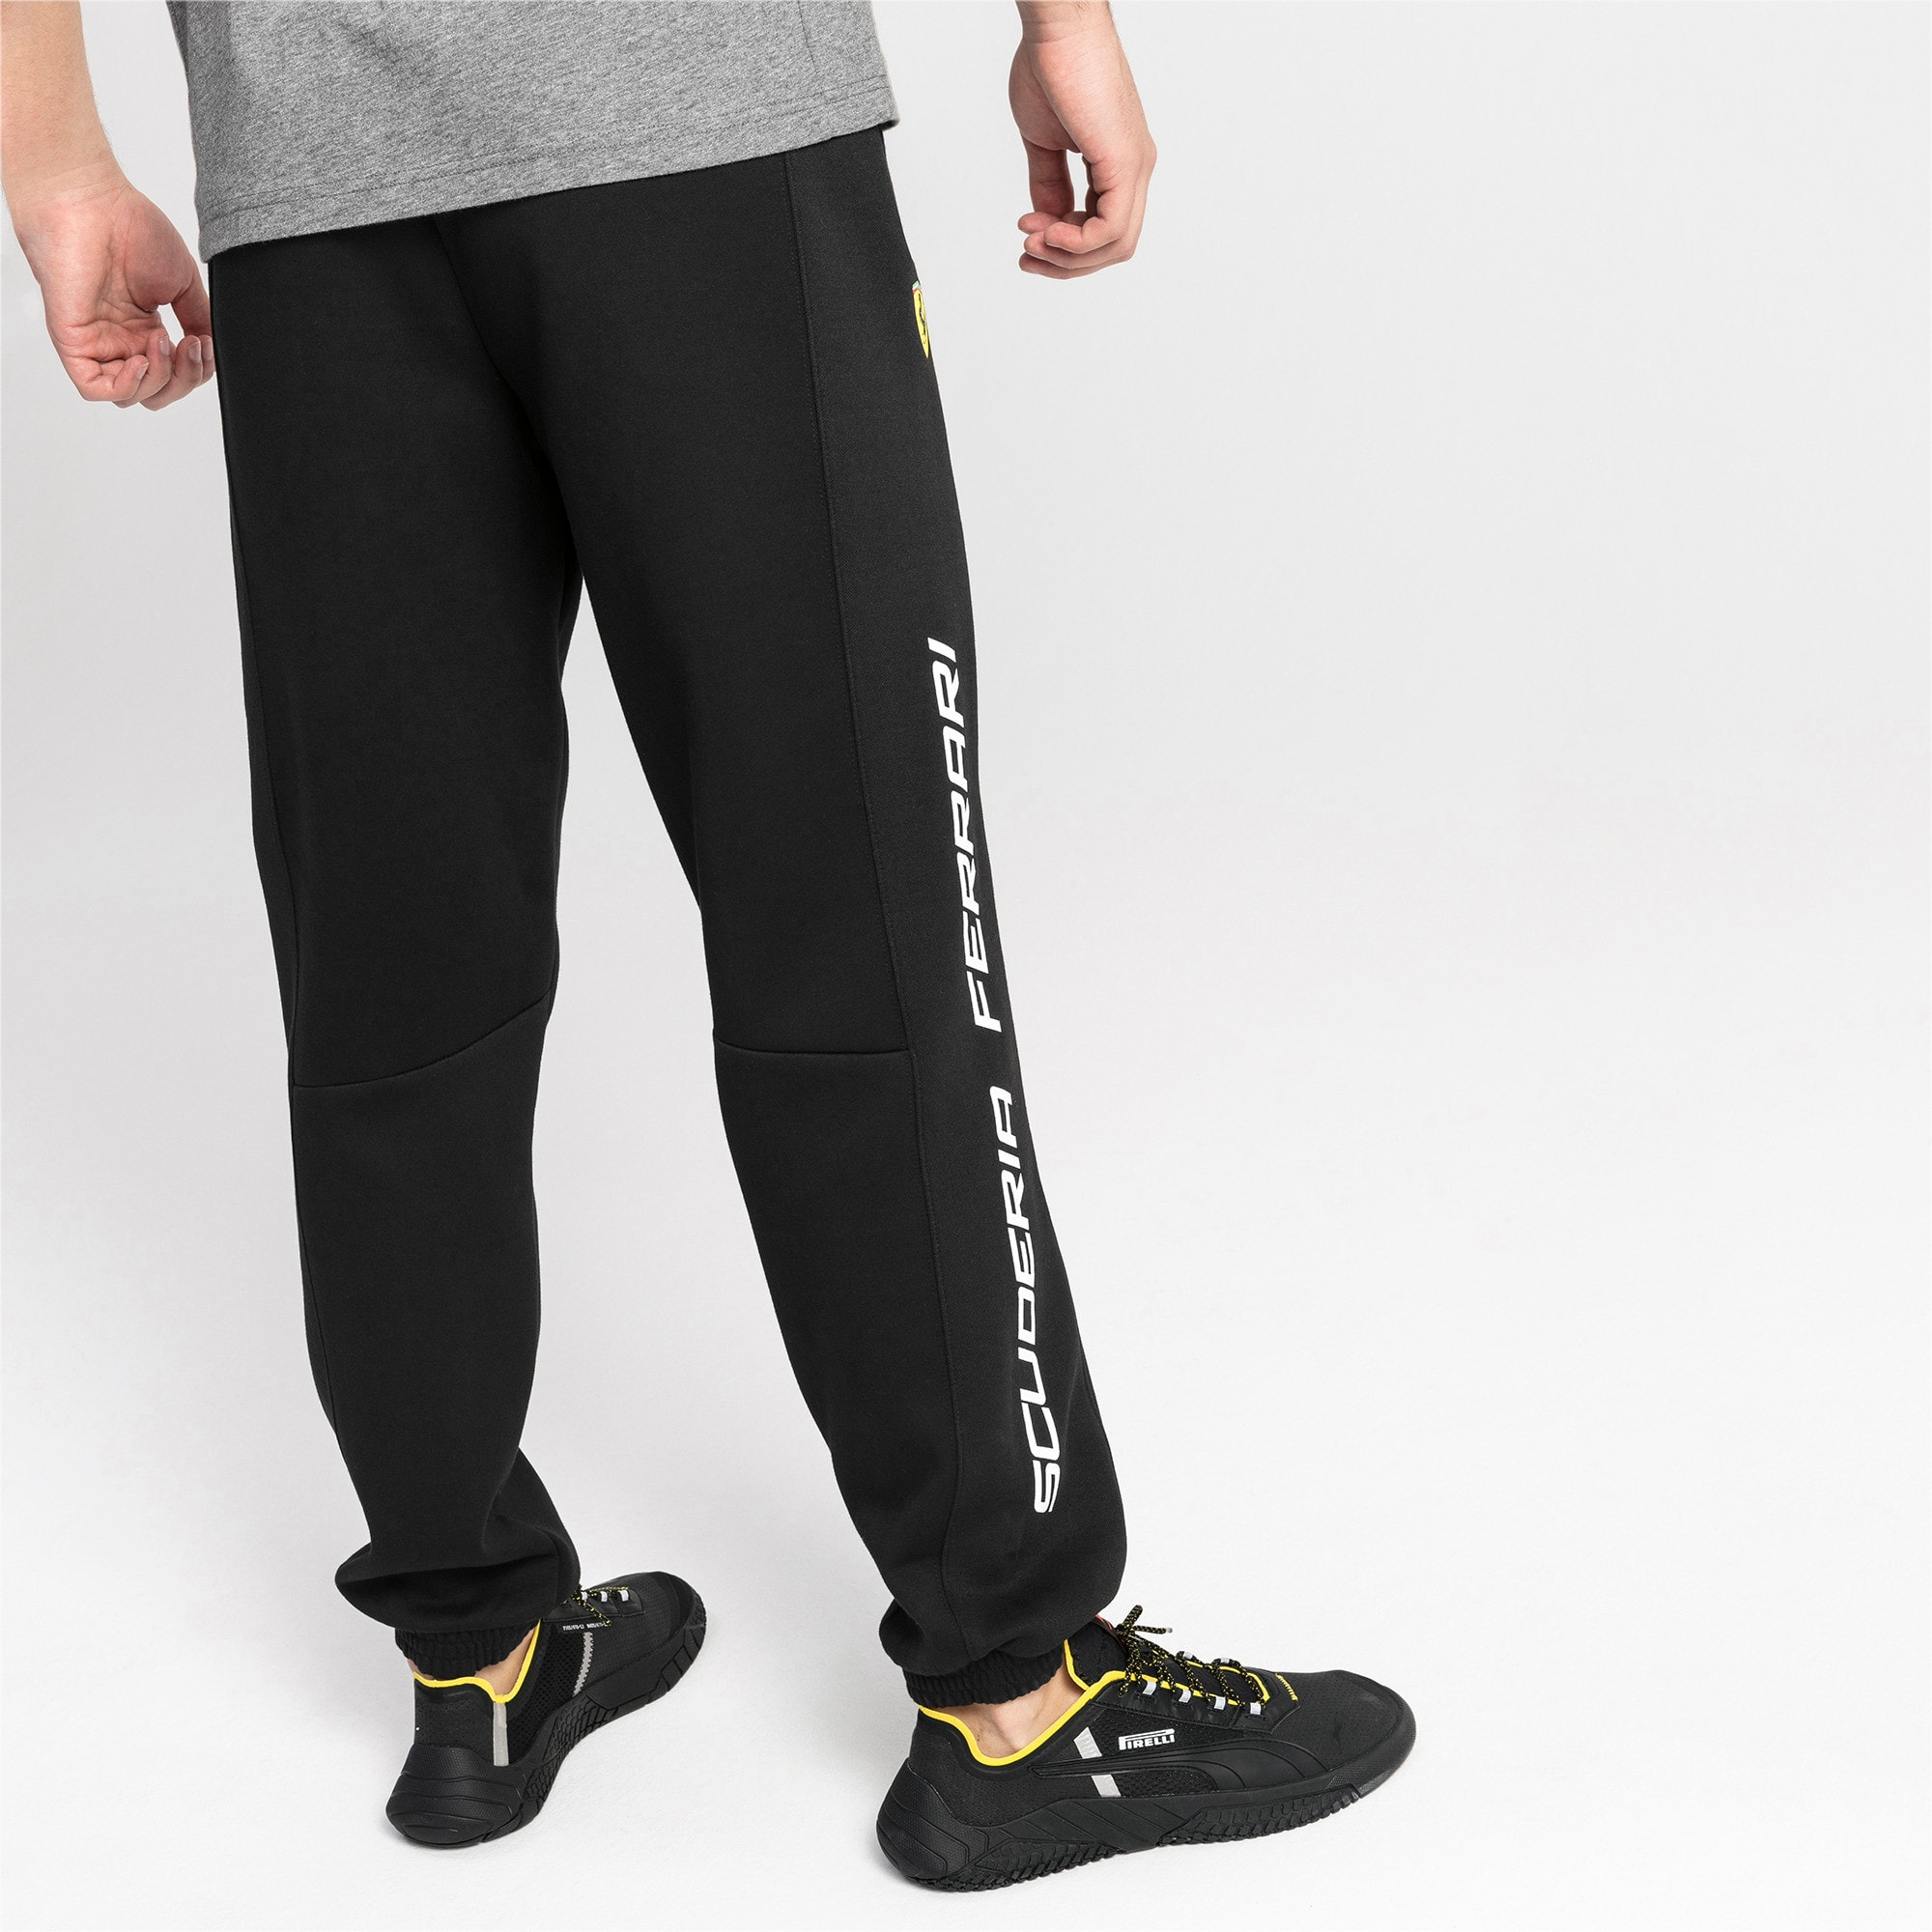 Thumbnail 2 of Ferrari Men's Sweatpants, Puma Black, medium